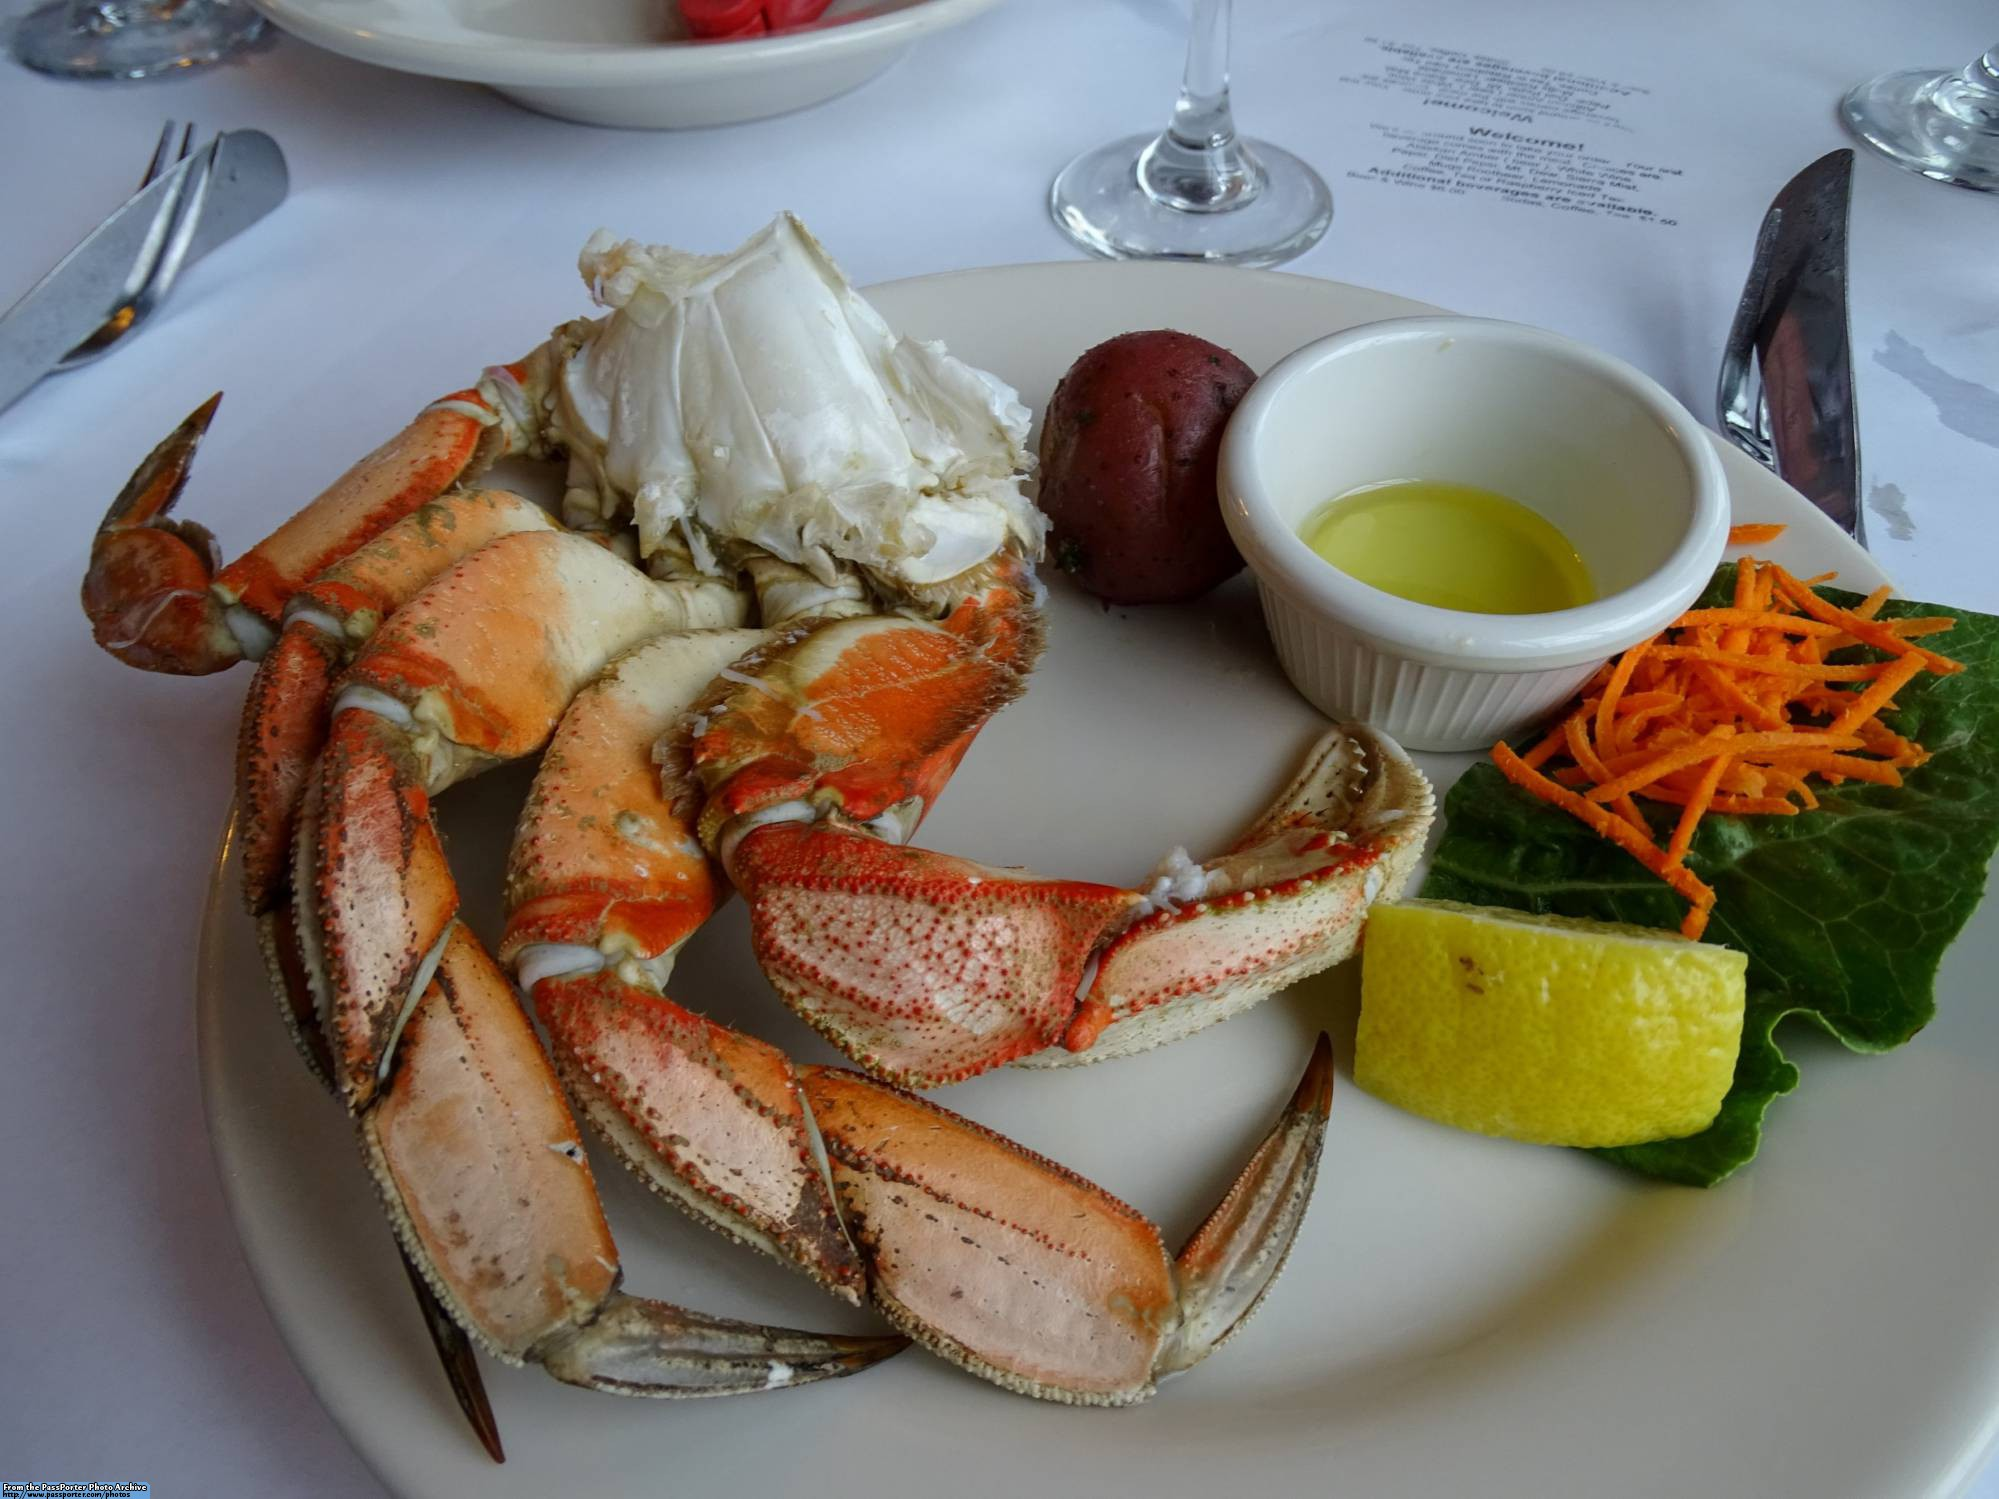 Enjoy a Crab Feast in Ketchikan Alaska on your Disney Cruise | PassPorter.com